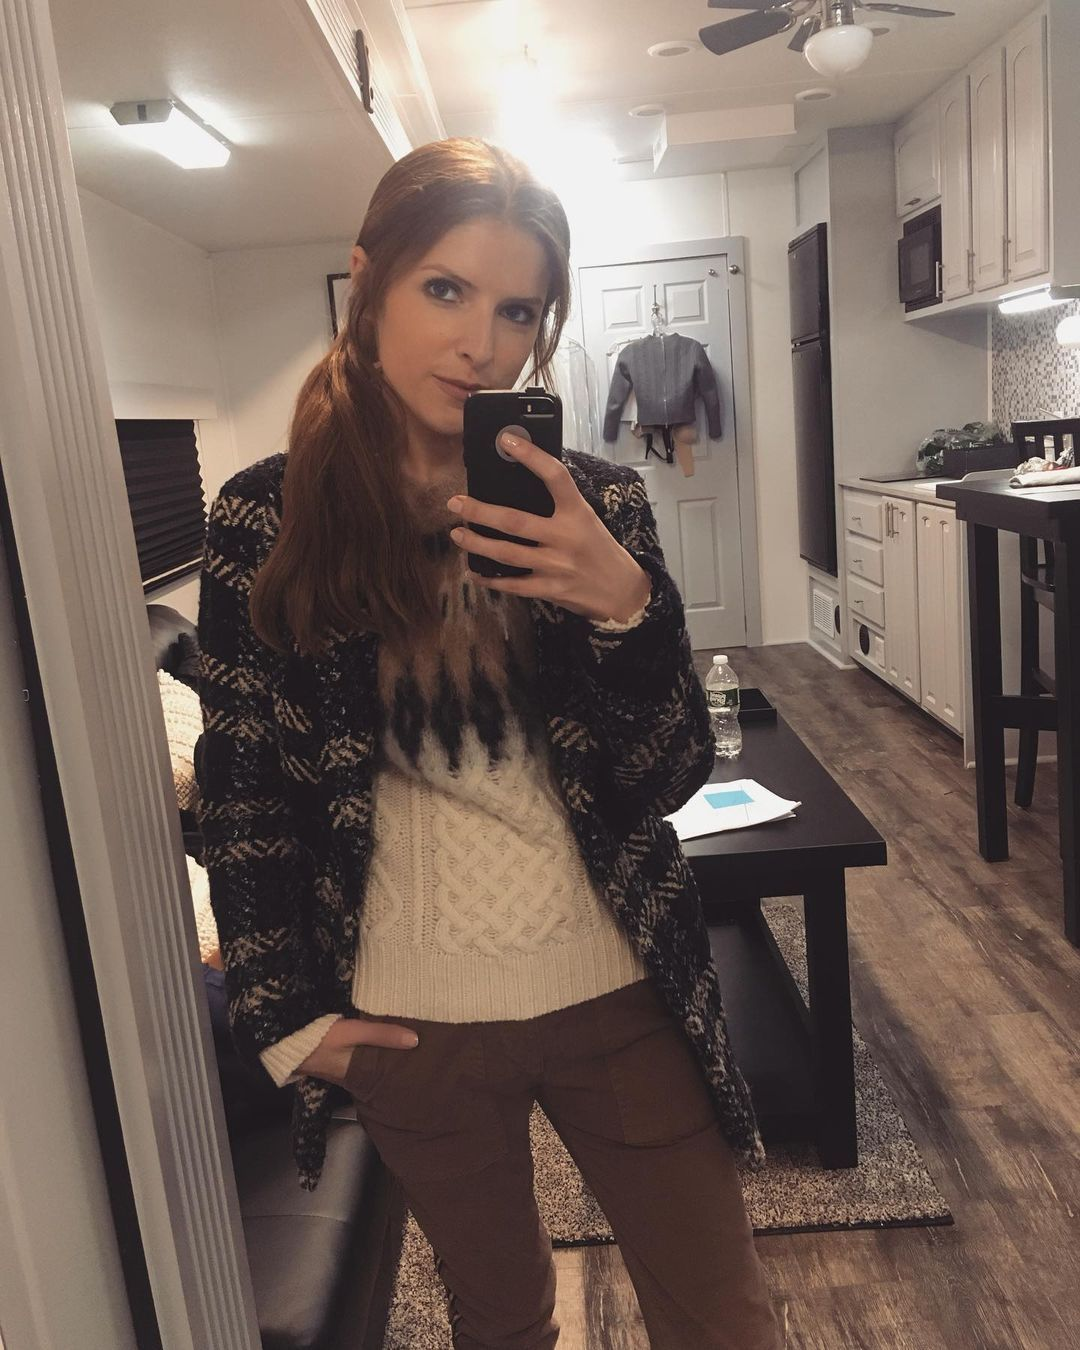 Anna Kendrick home selfie